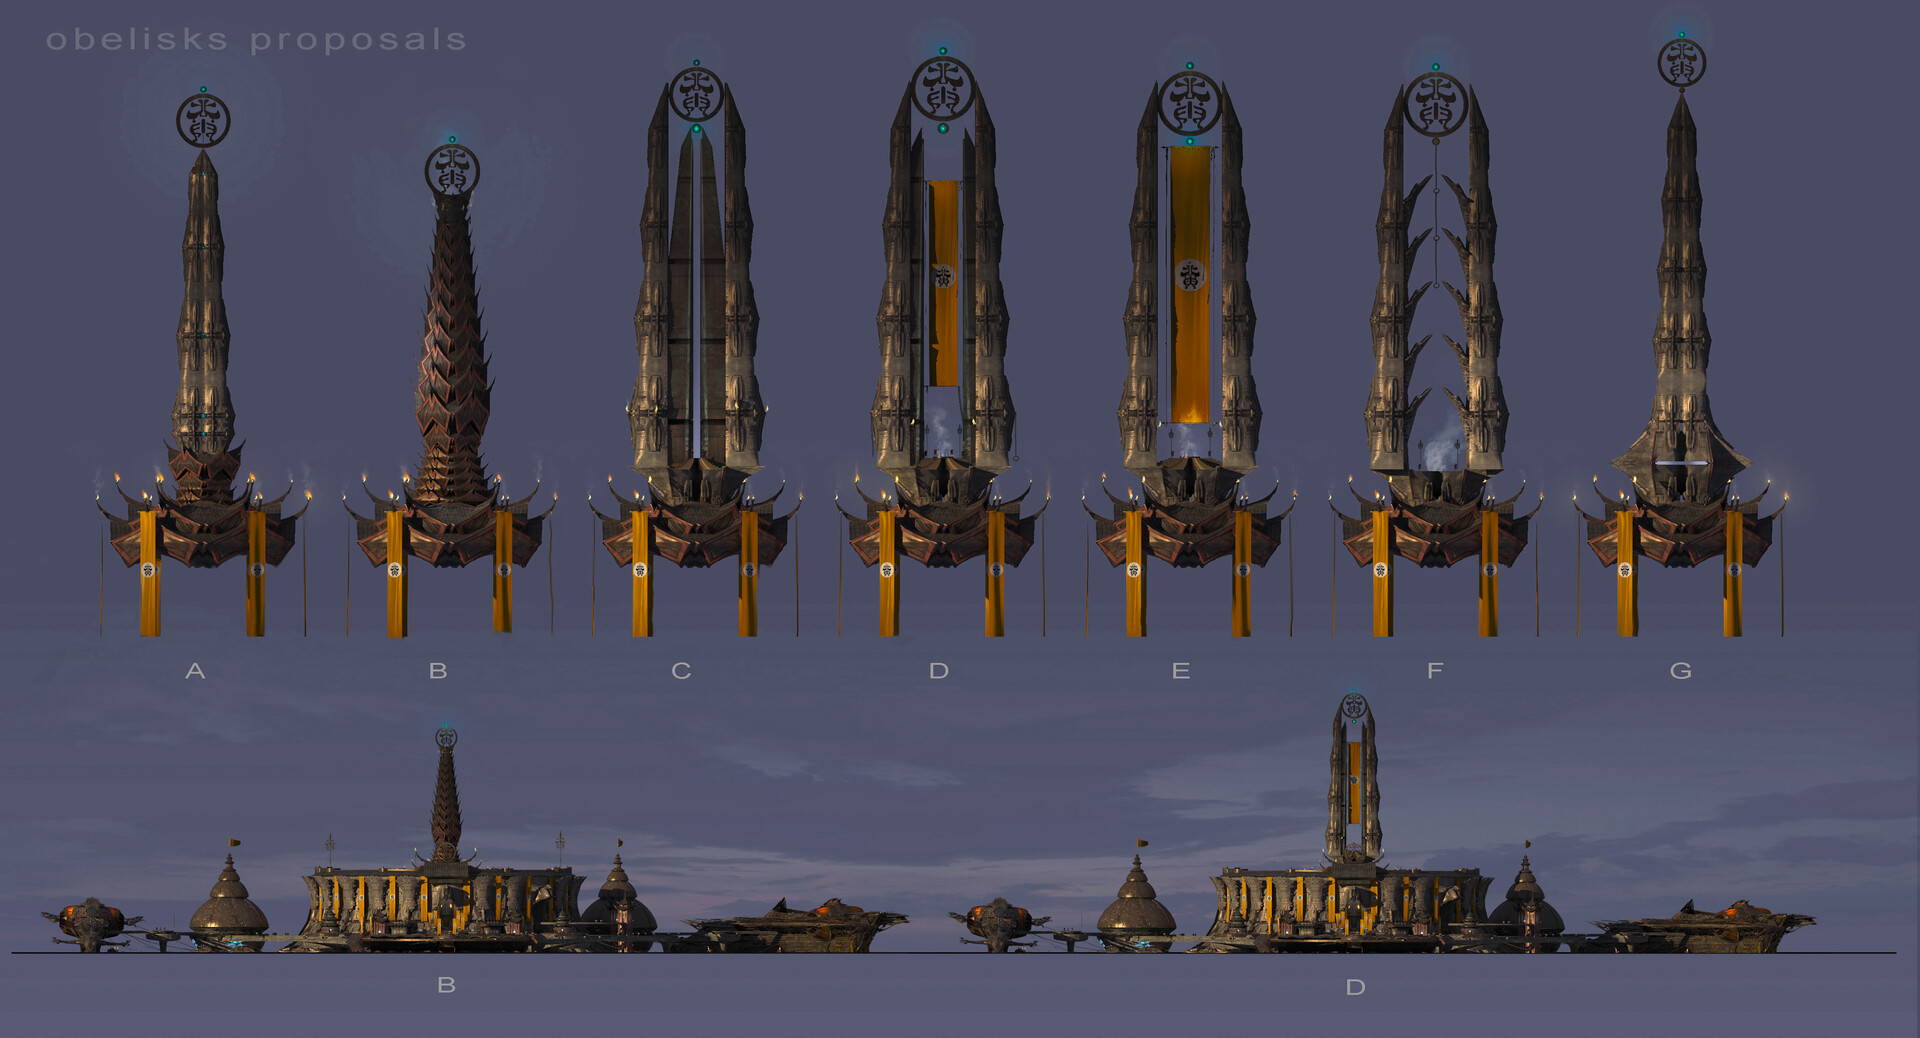 obelisk study